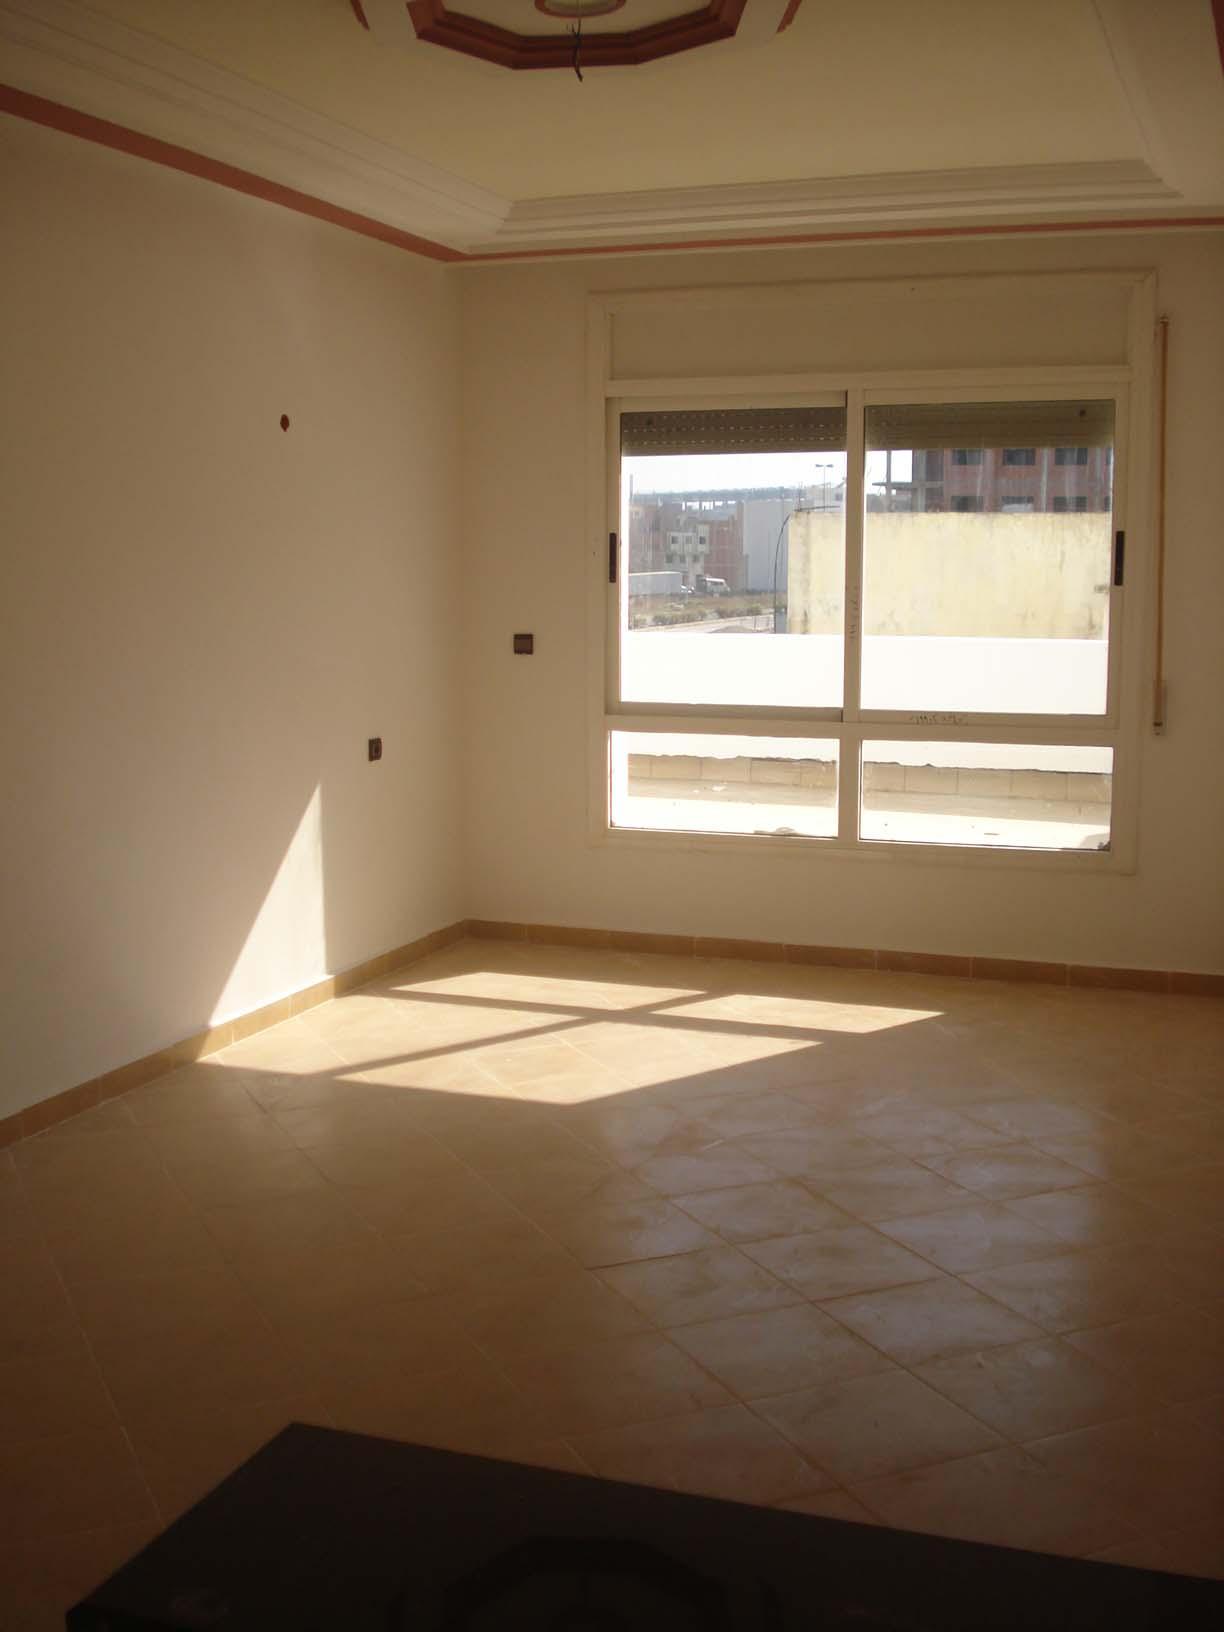 Vente appartement tanger maroc moyen standing for Chambre de commerce tanger